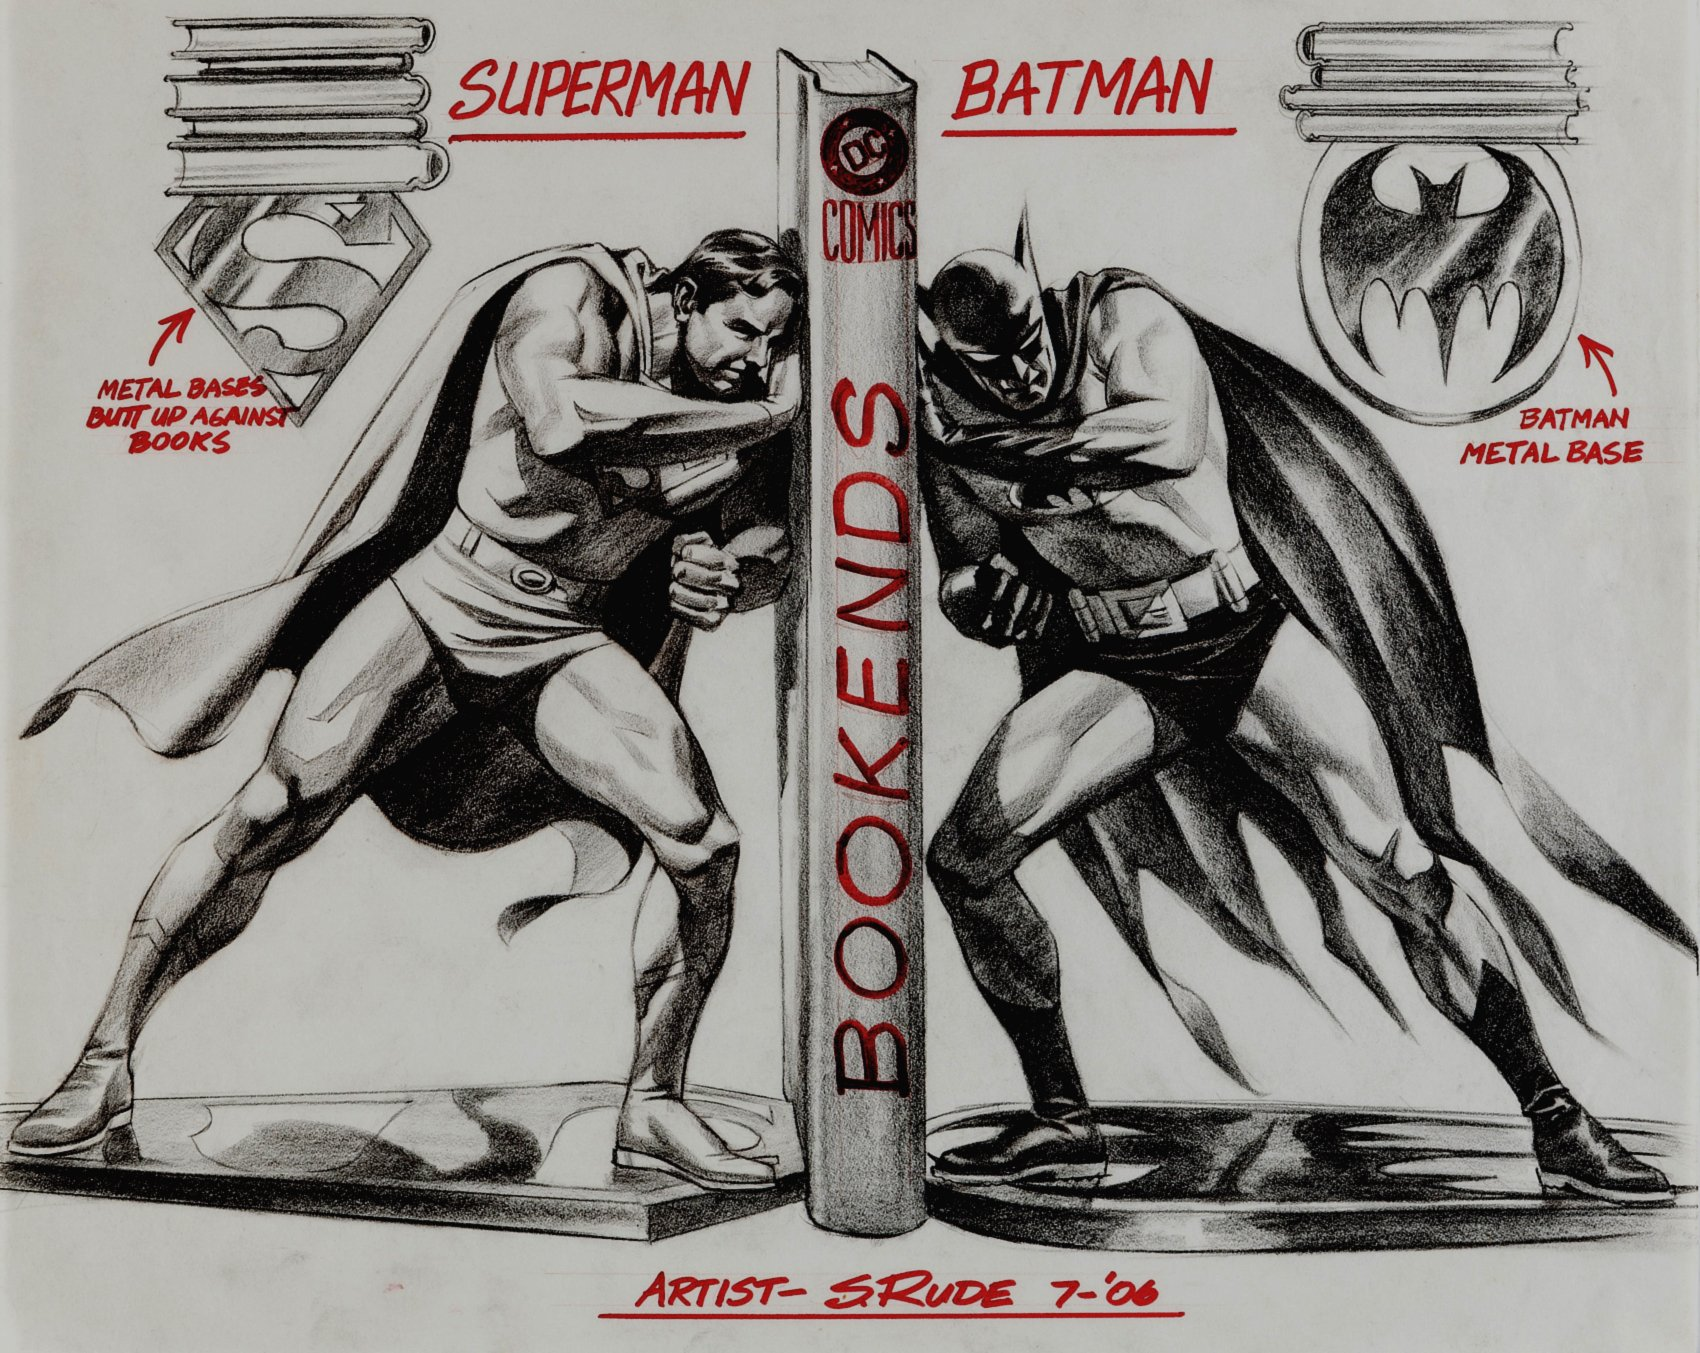 Superman / Batman: World's Finest Bookend Design (SOLD LIVE ON 'DUELING DEALERS OF COMIC ART' EPISODE #37 PODCAST ON 9-22-2021